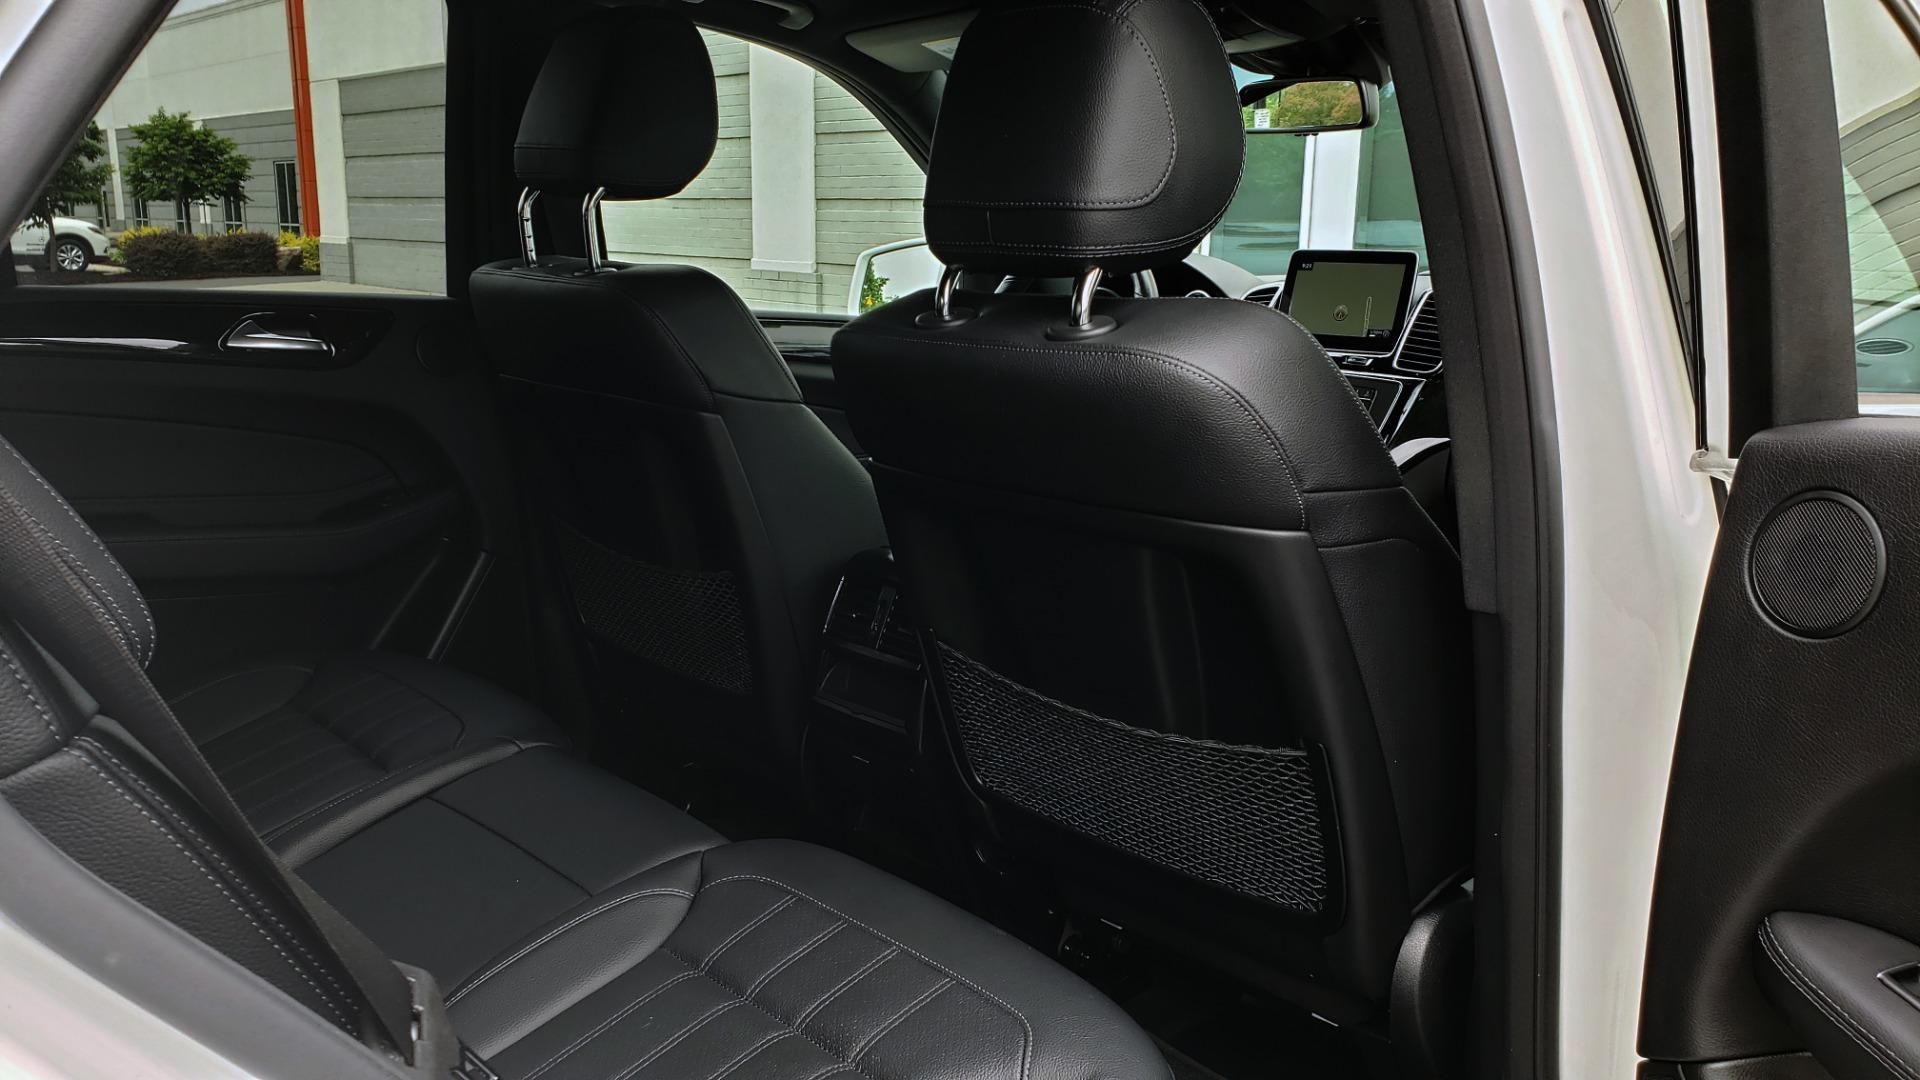 Used 2018 Mercedes-Benz GLE 350 4MATIC / PREM PKG / NAV / PARK ASST / K/H SND / HITCH / REARVIEW for sale $40,801 at Formula Imports in Charlotte NC 28227 79